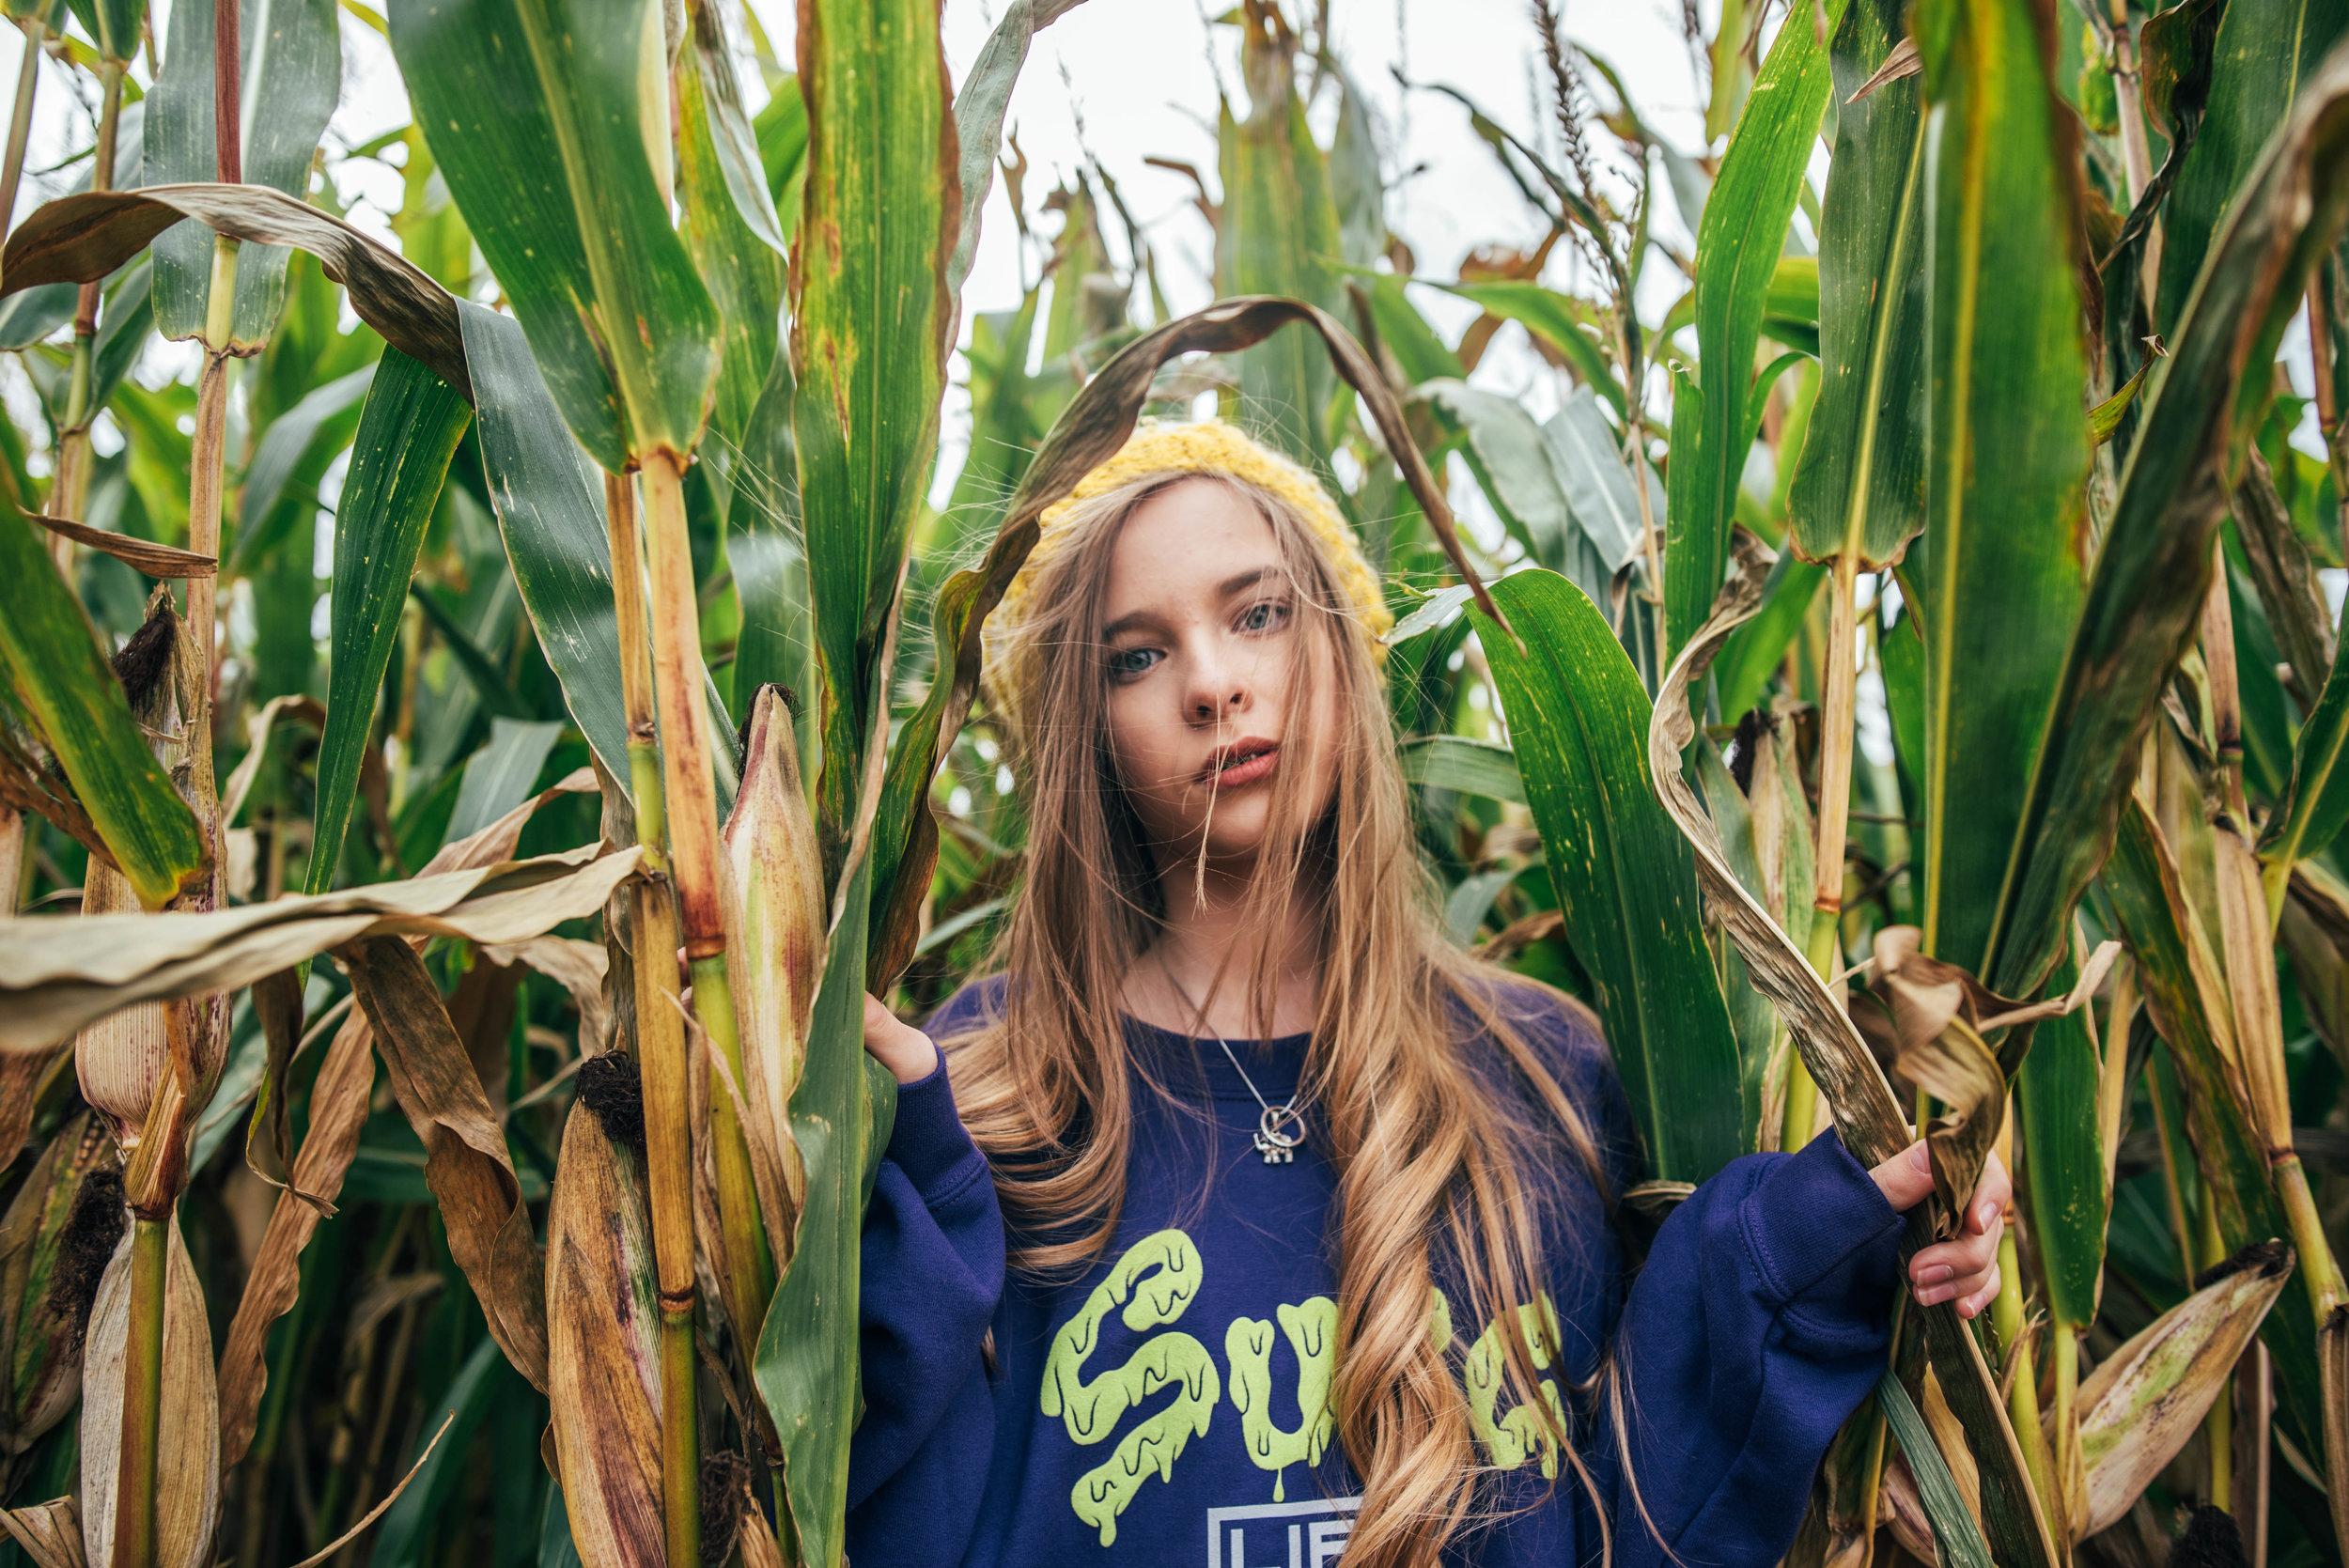 Teen girl in Sugg Life jumper stands in cornfield Essex UK Documentary Wedding Photographer